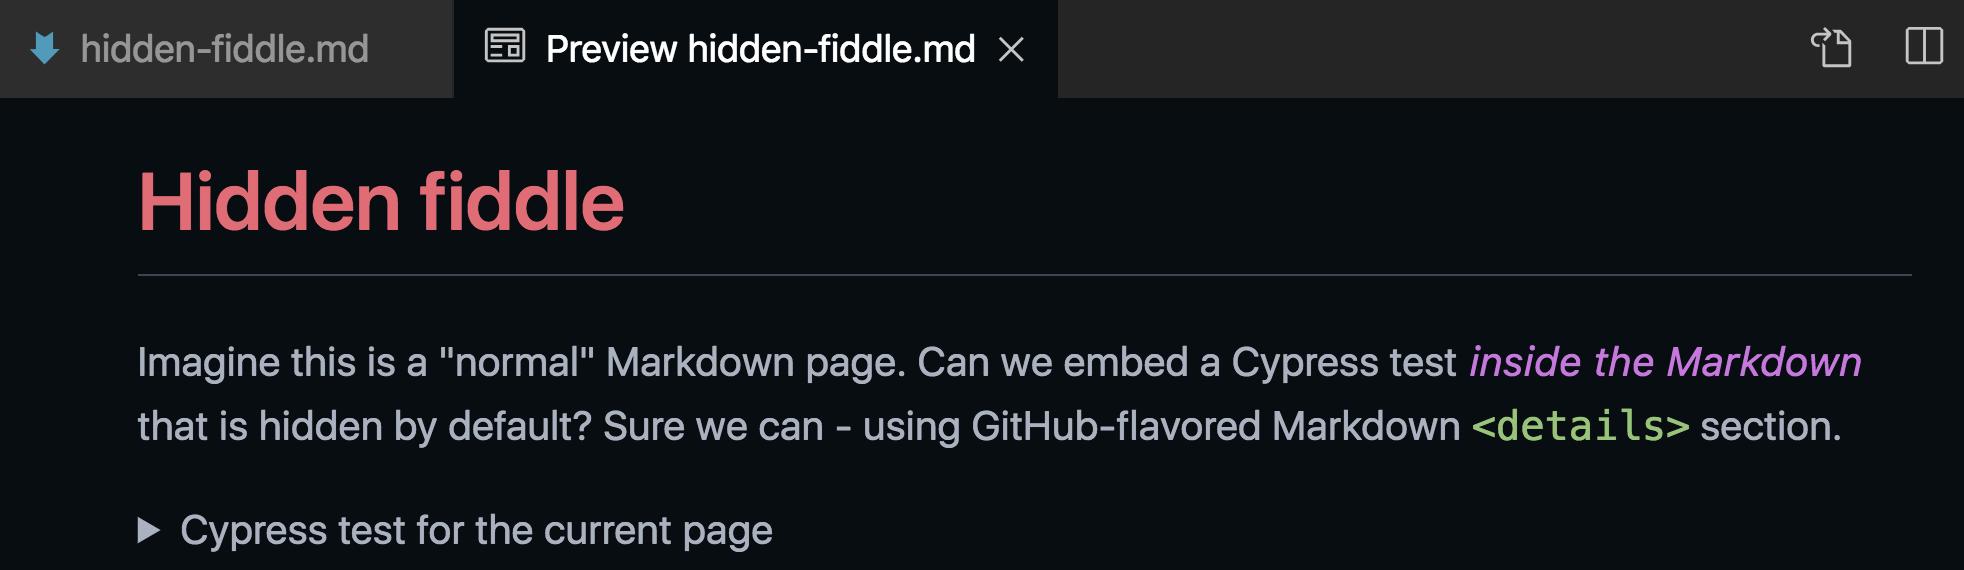 Hidden fiddle Markdown preview